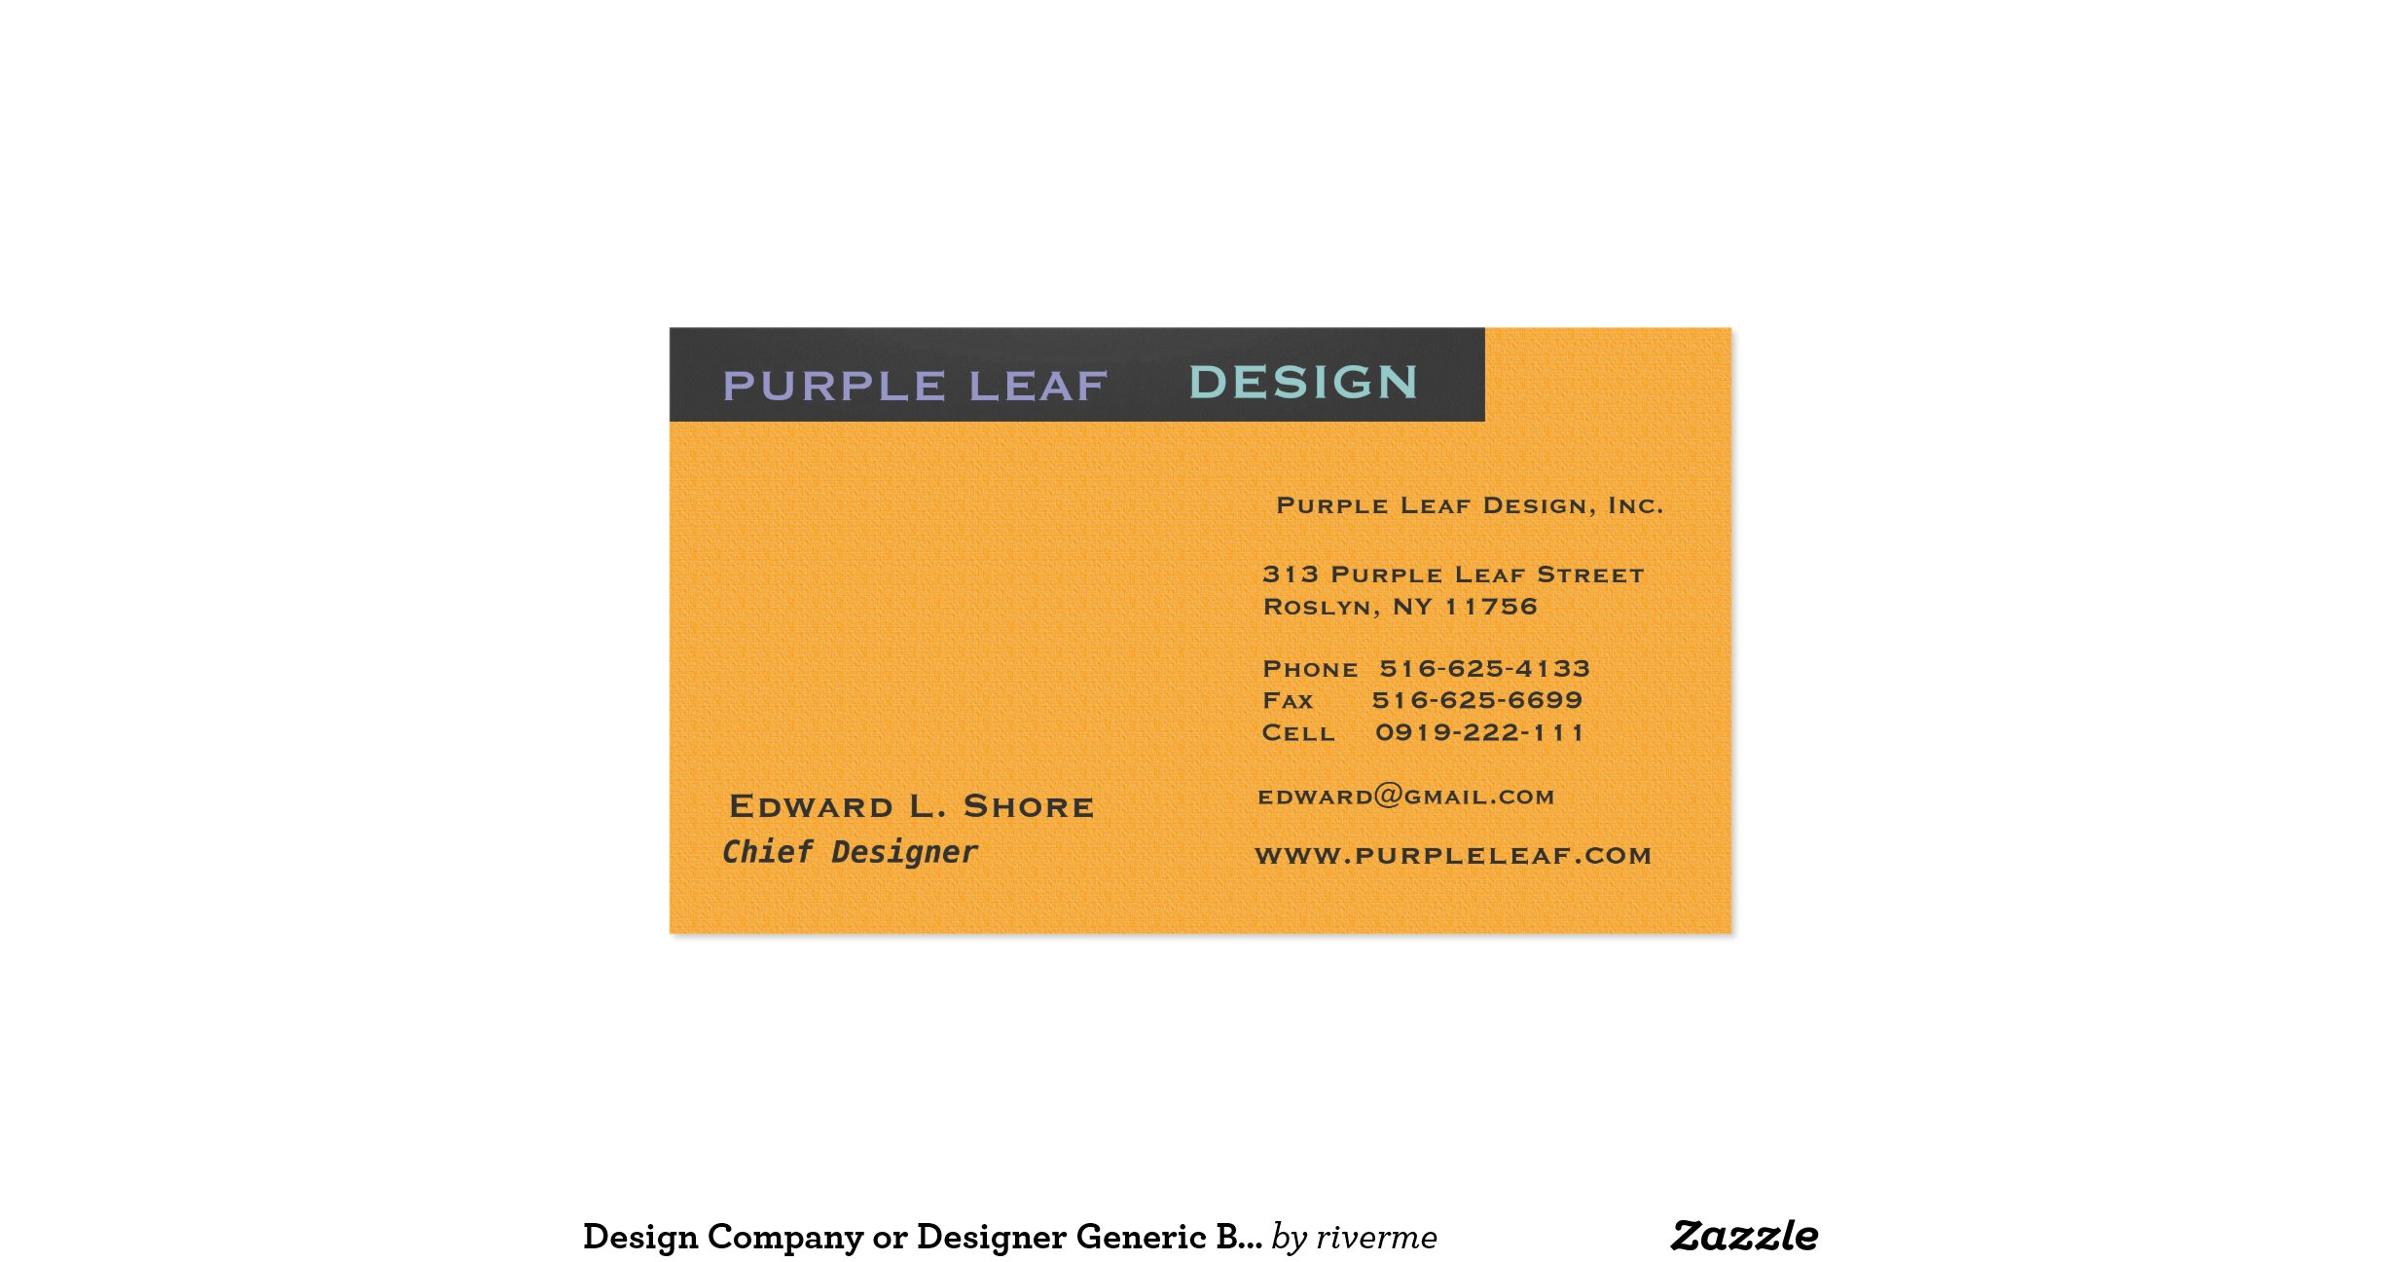 Design company or designer generic business card for Generic business cards